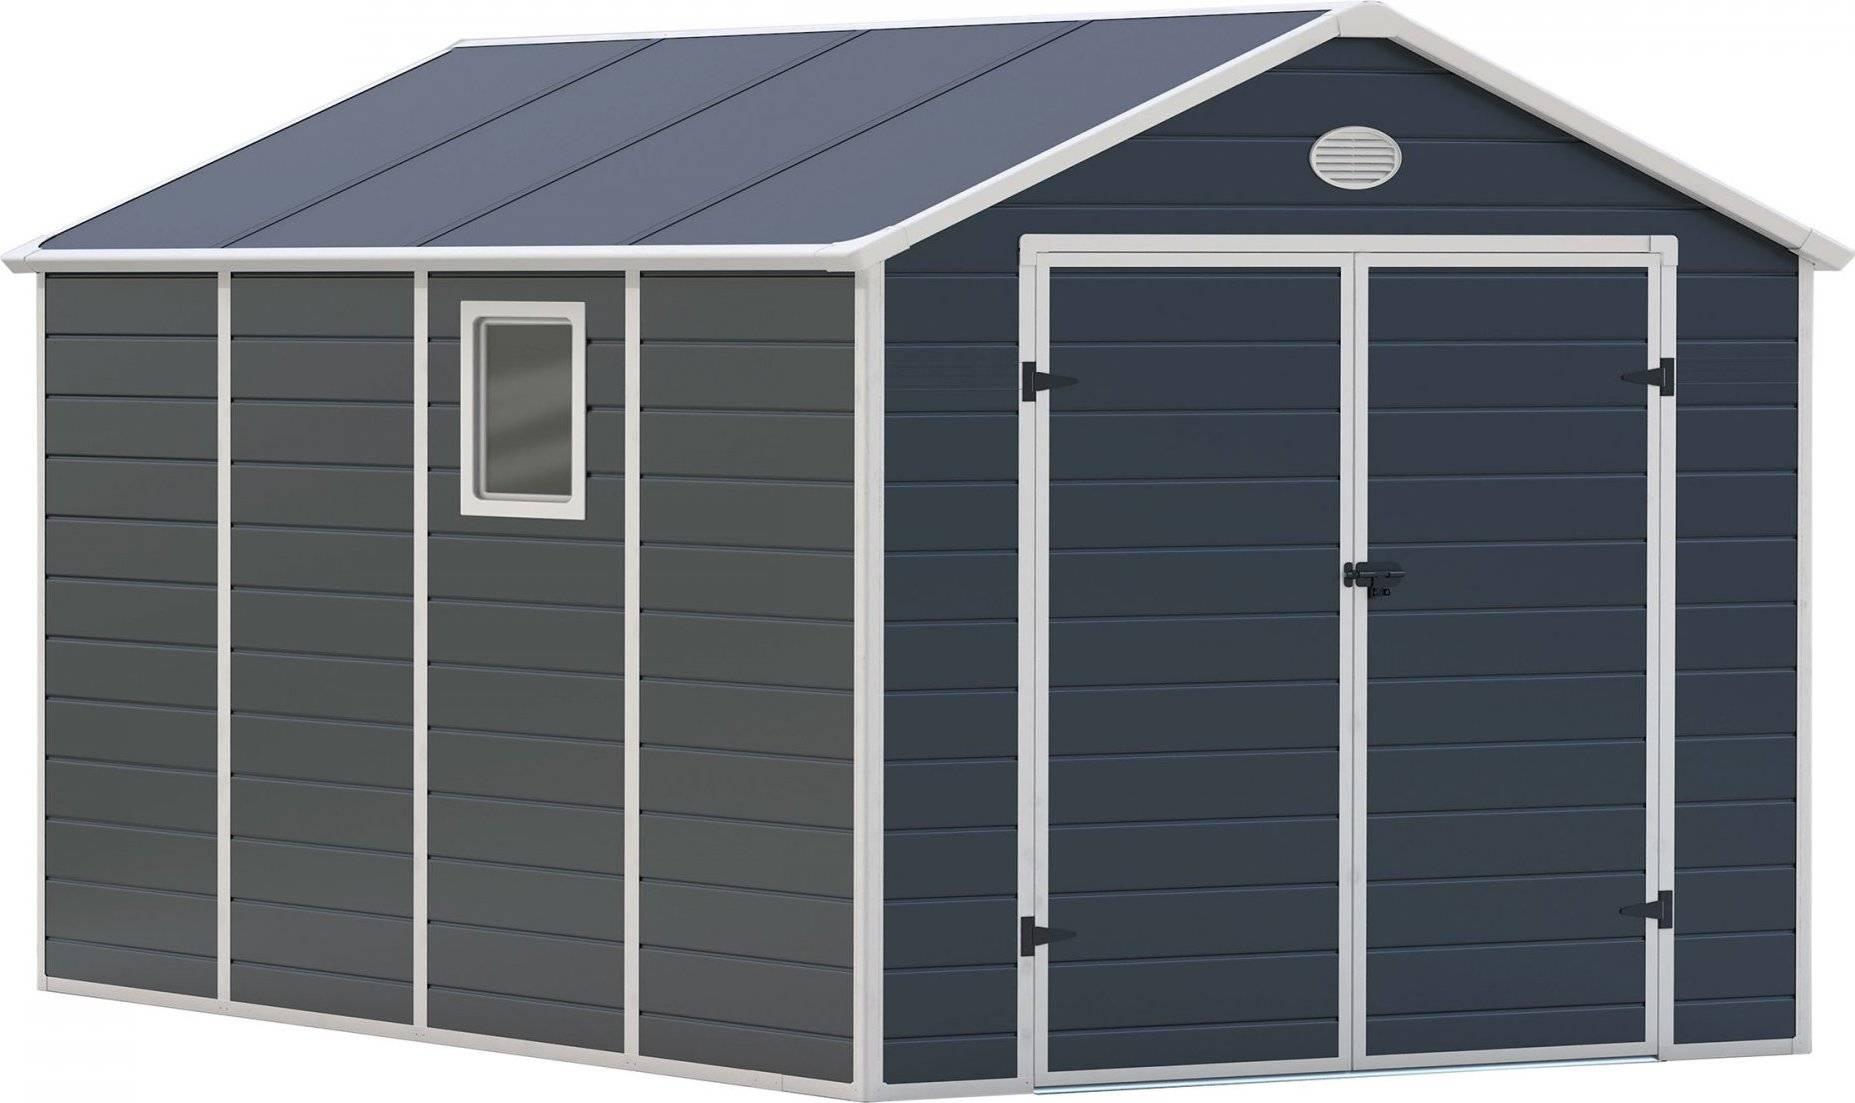 Zahradní domek PAH 882 - 241 x 366 cm, plastový, šedý 6390040 G21